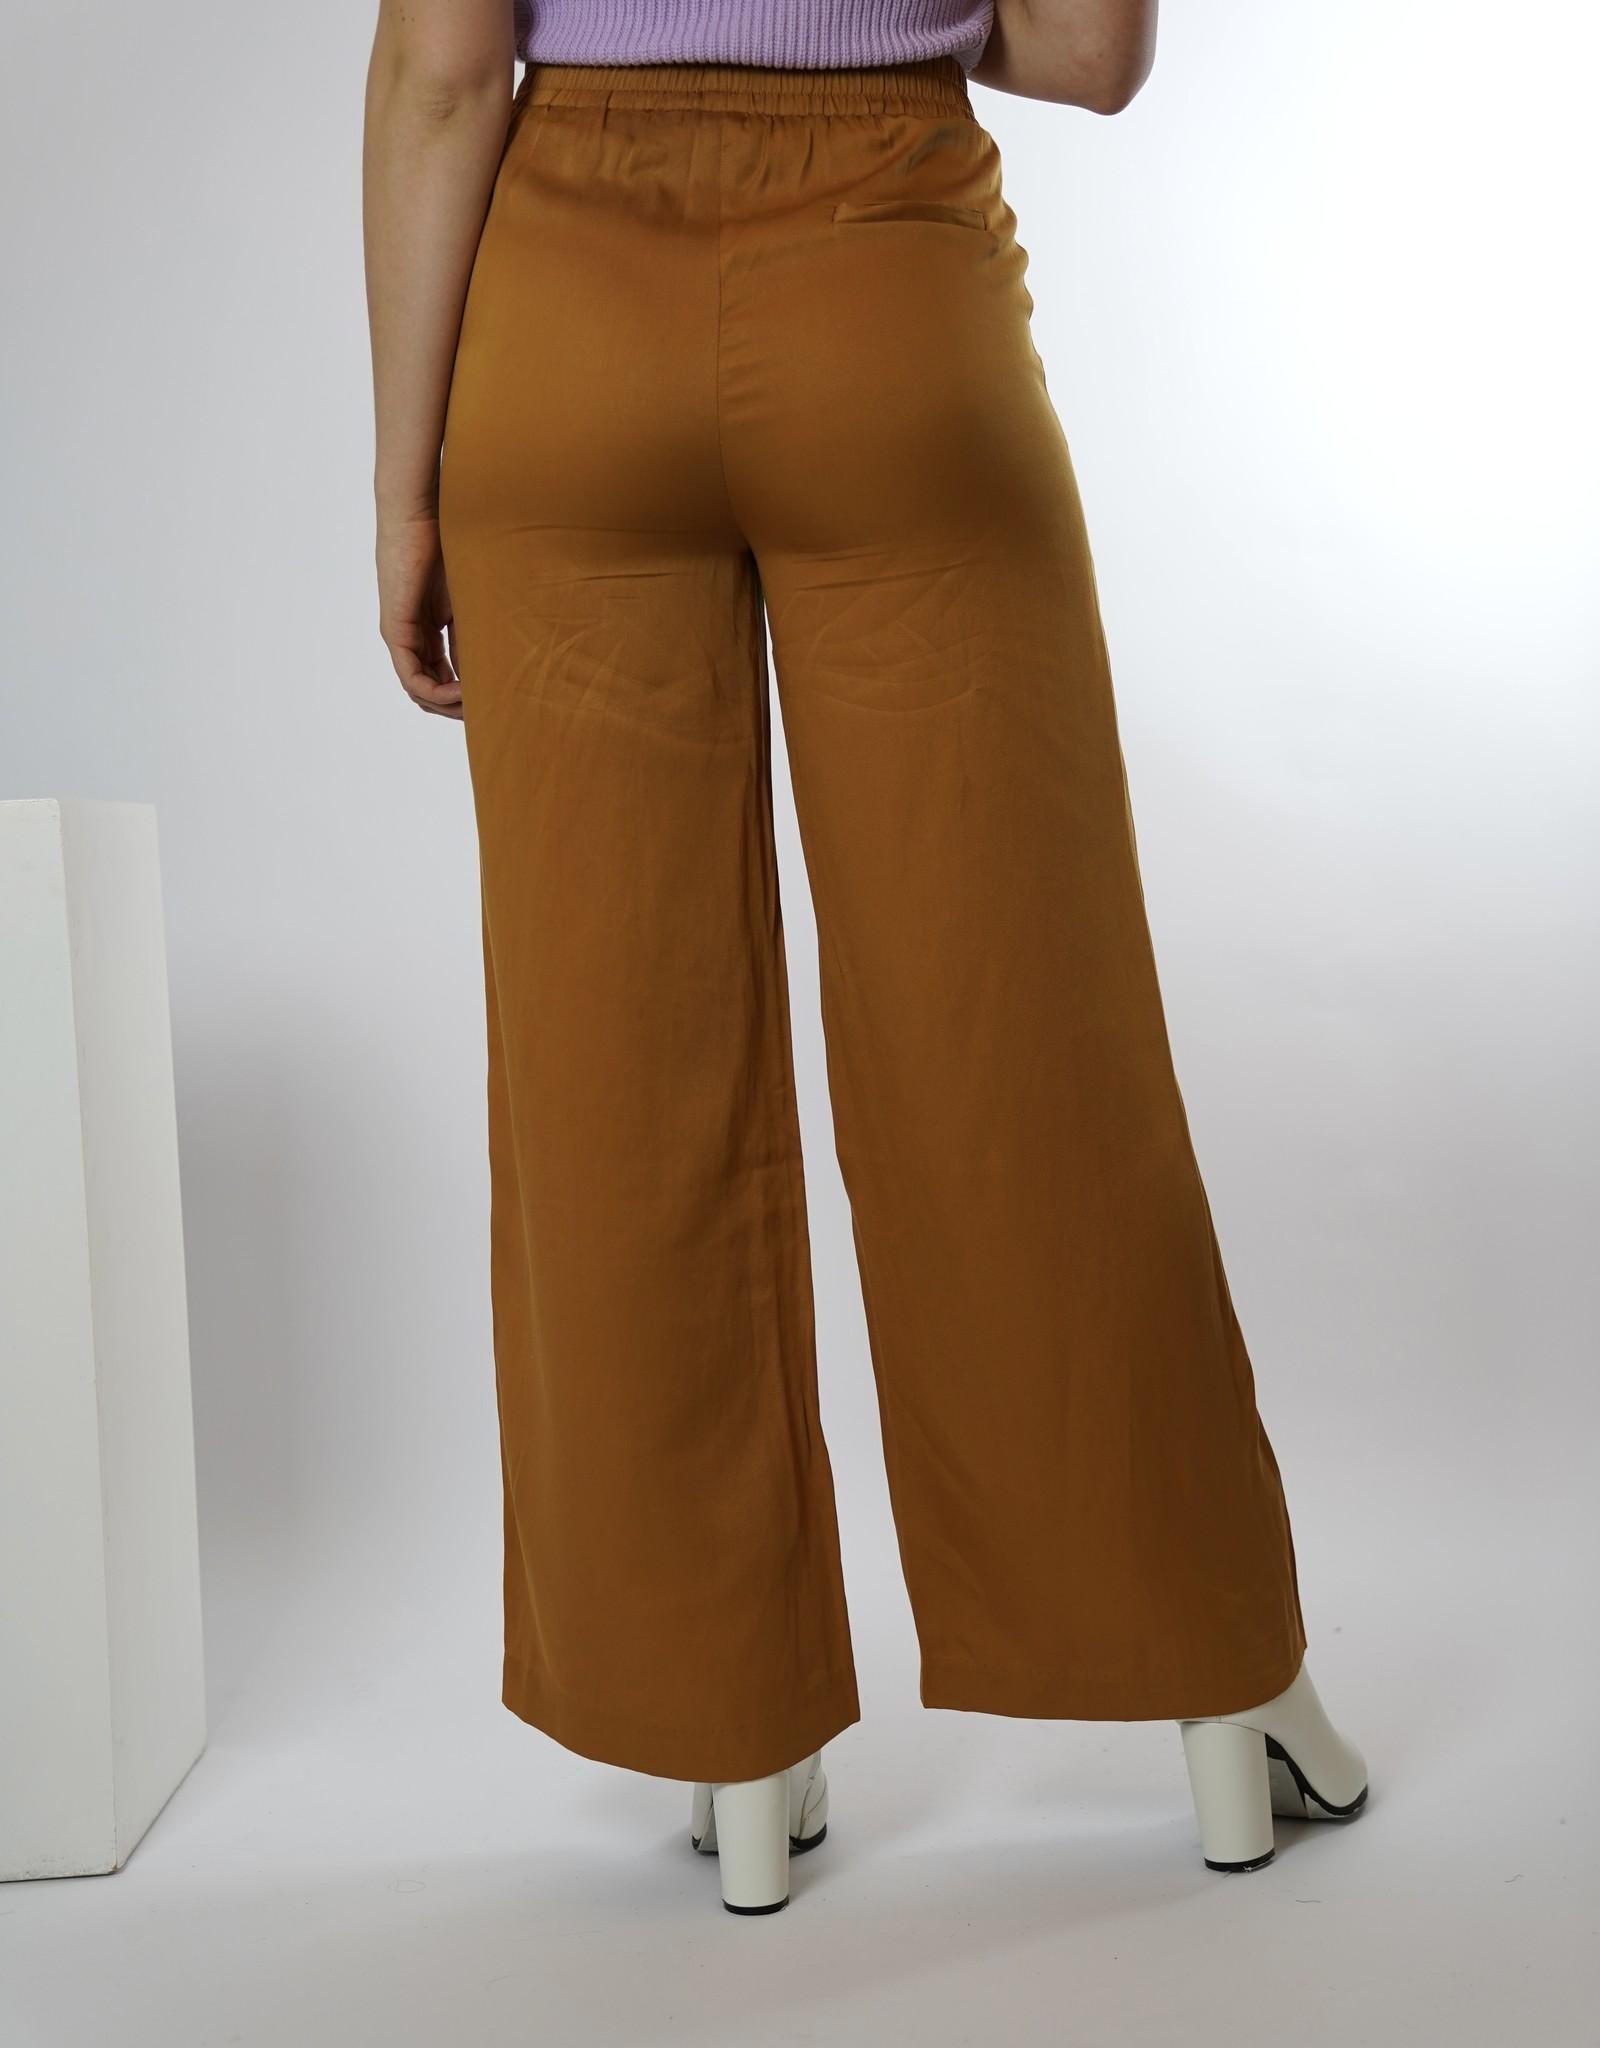 FRNCH FRNCH -Palmina Pantalon